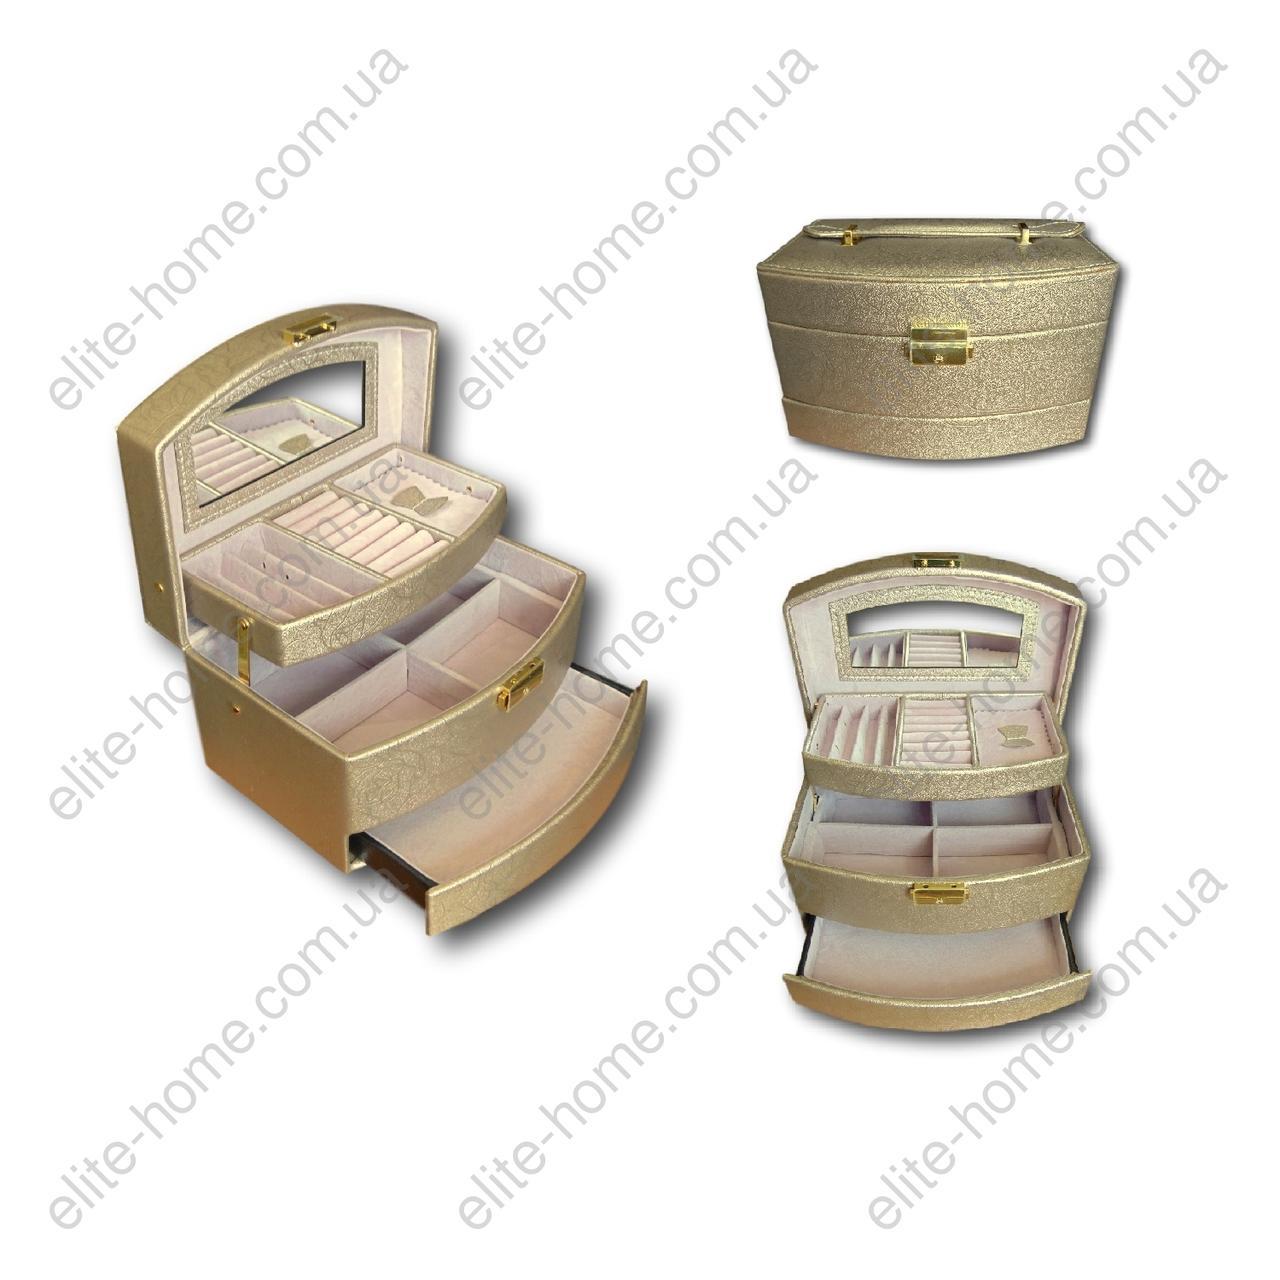 Шкатулка - автомат (трансформер) для украшений (21,5х15х13см)